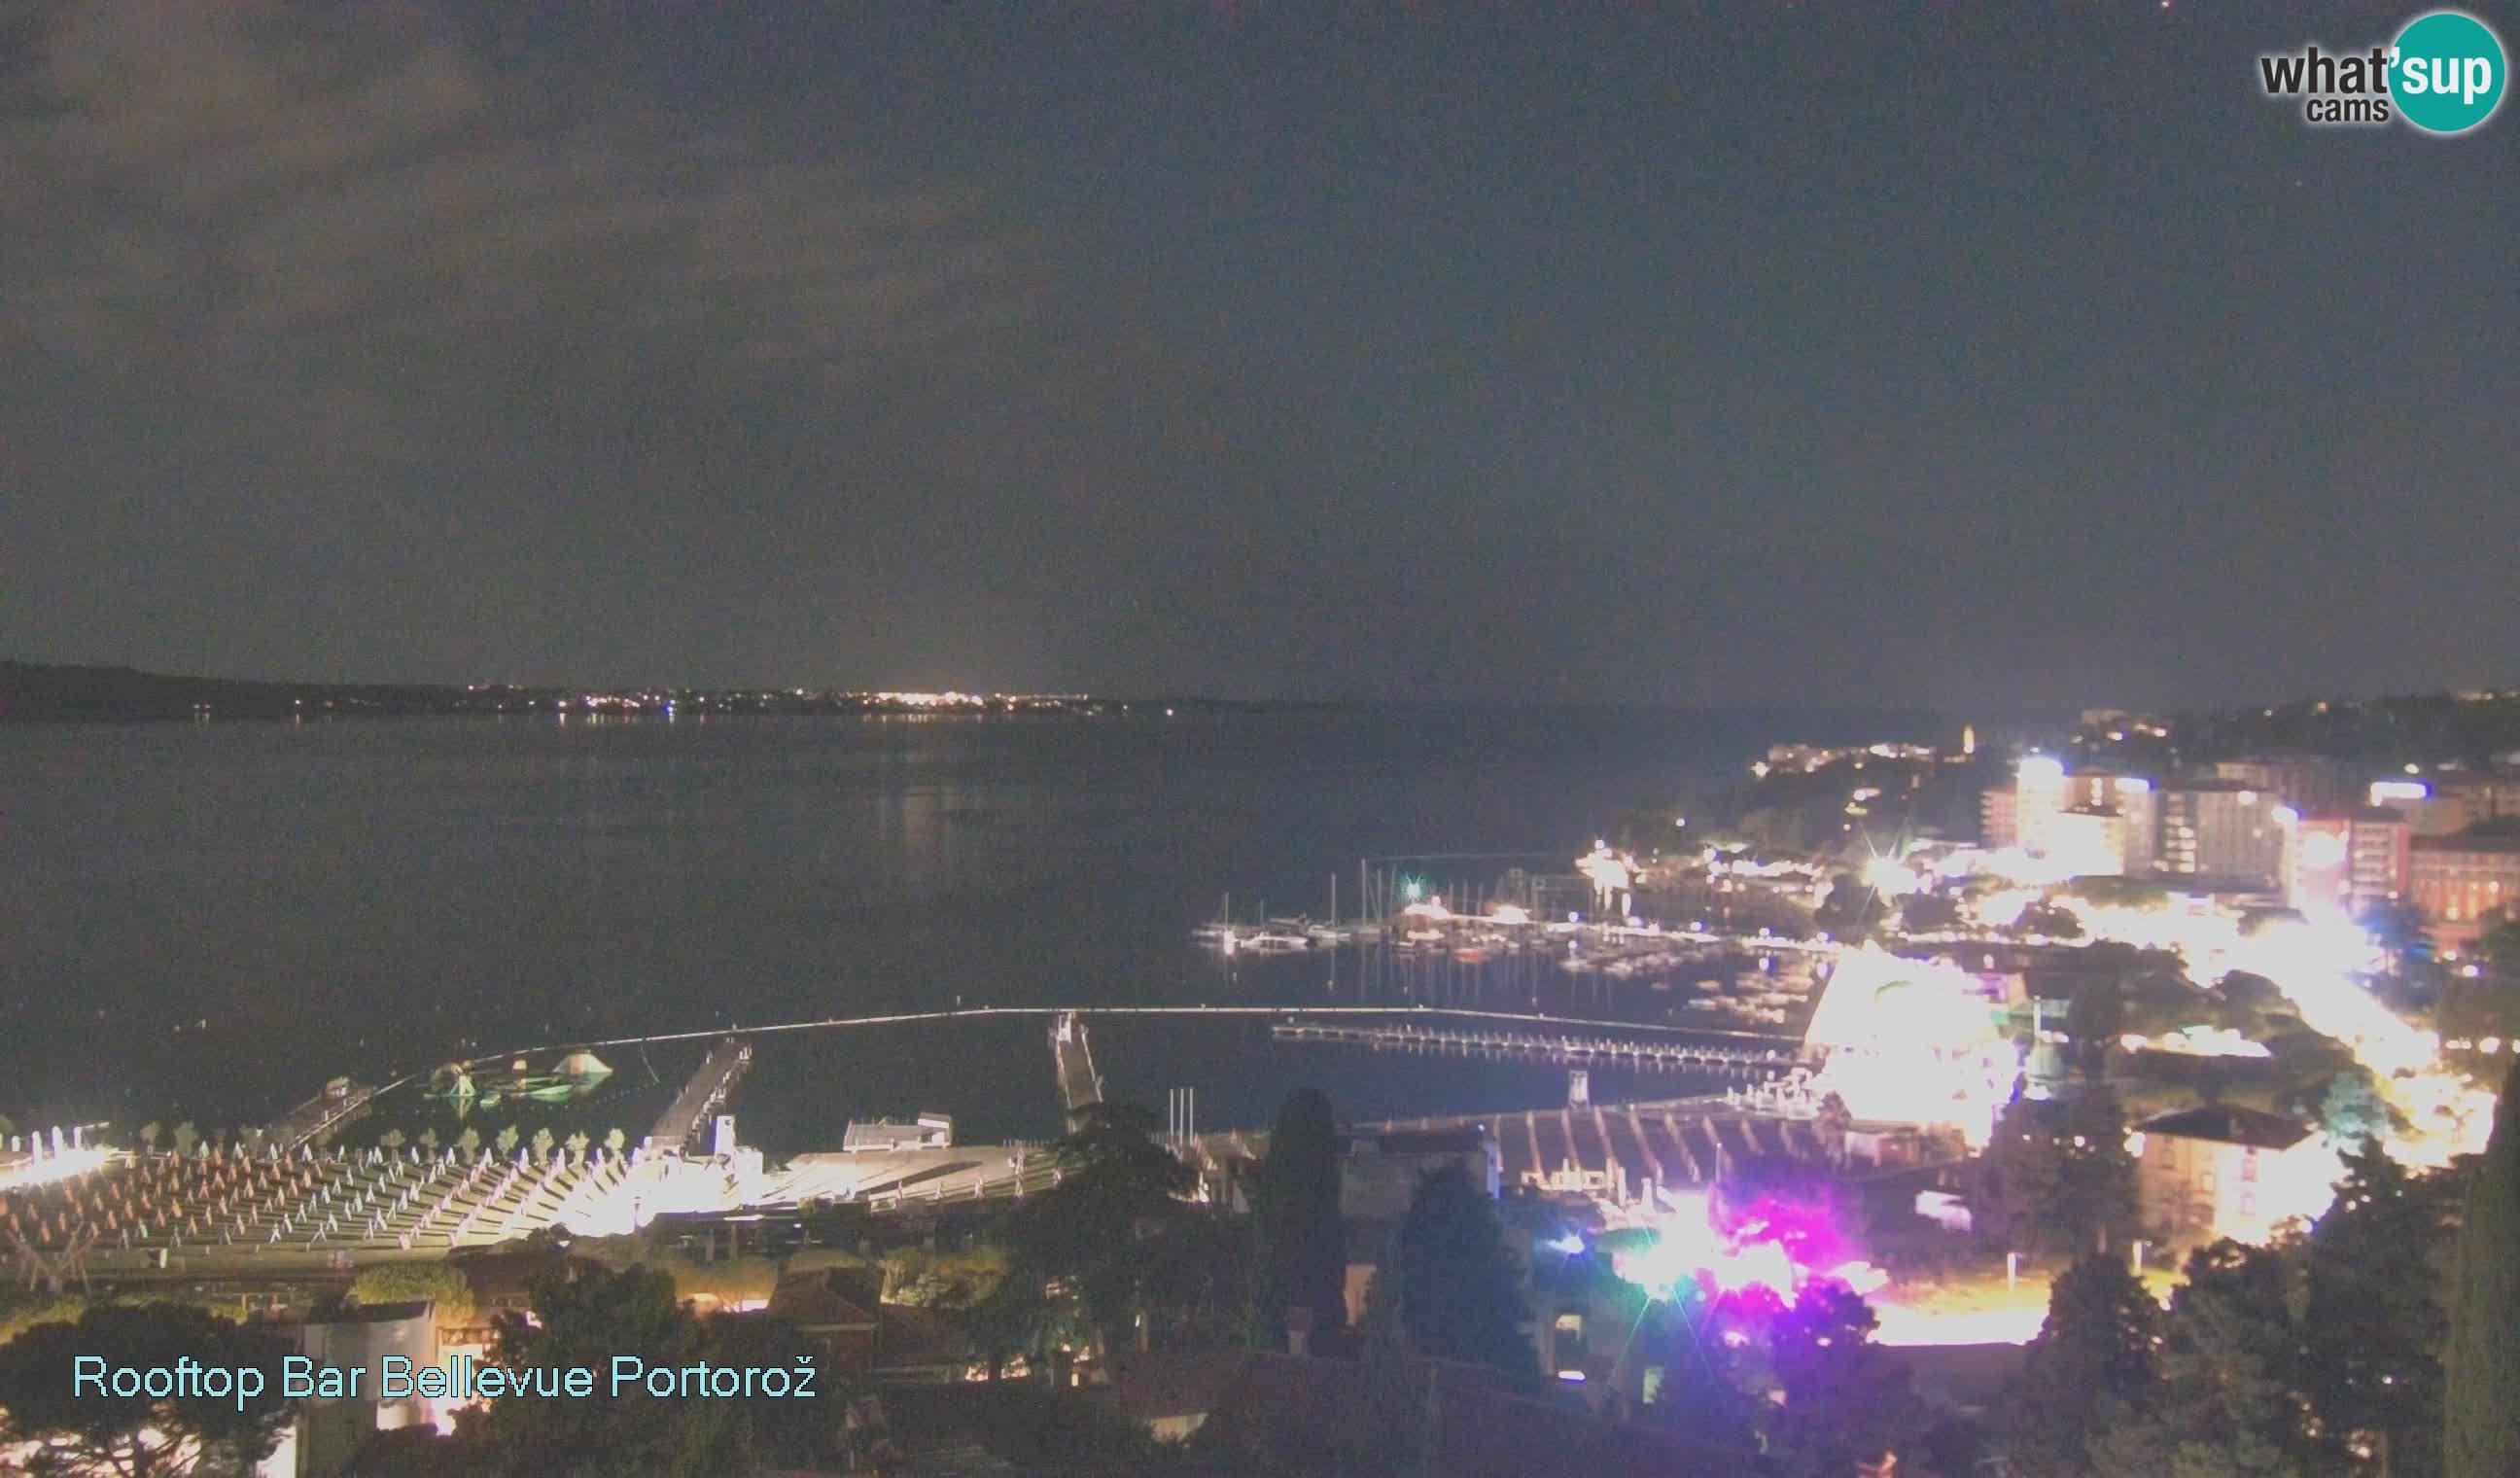 Portorož Sun. 00:37